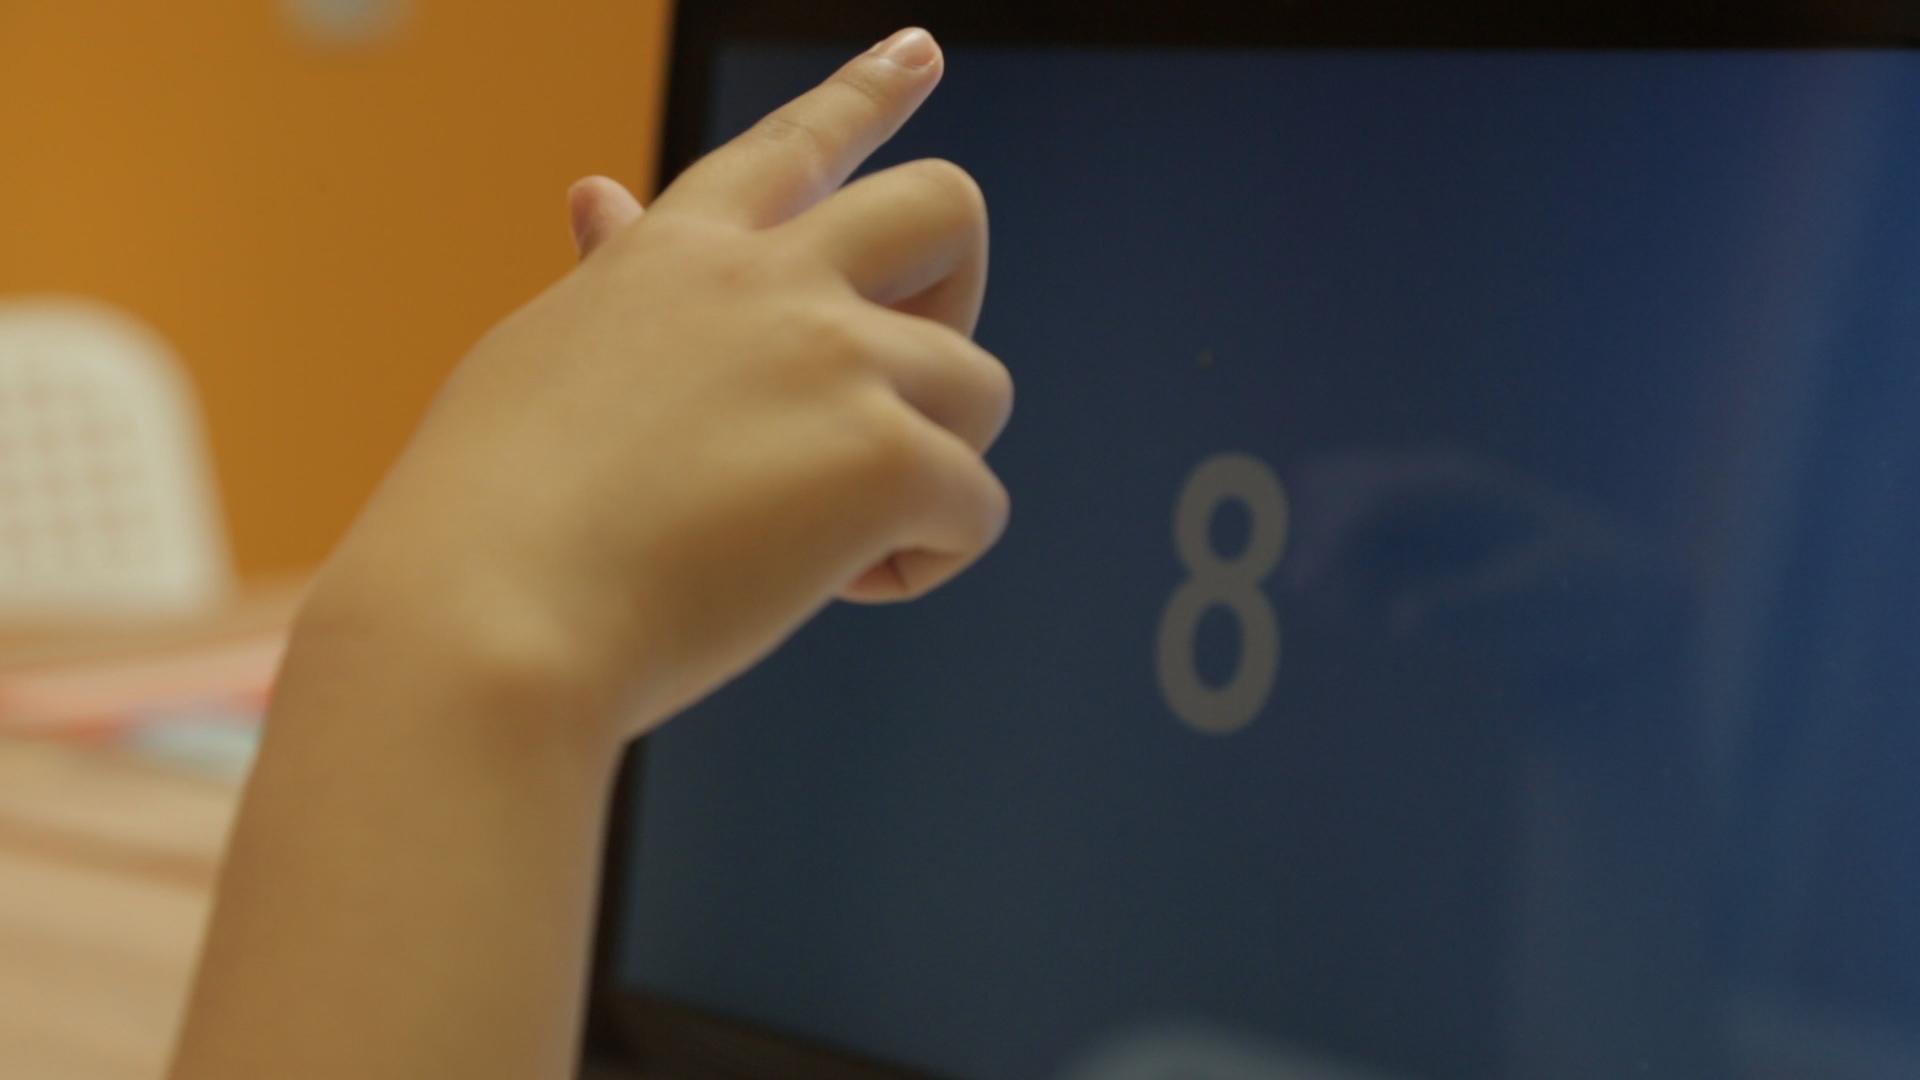 Цифры мелькают на экране с интервалом в 0,7 секунды